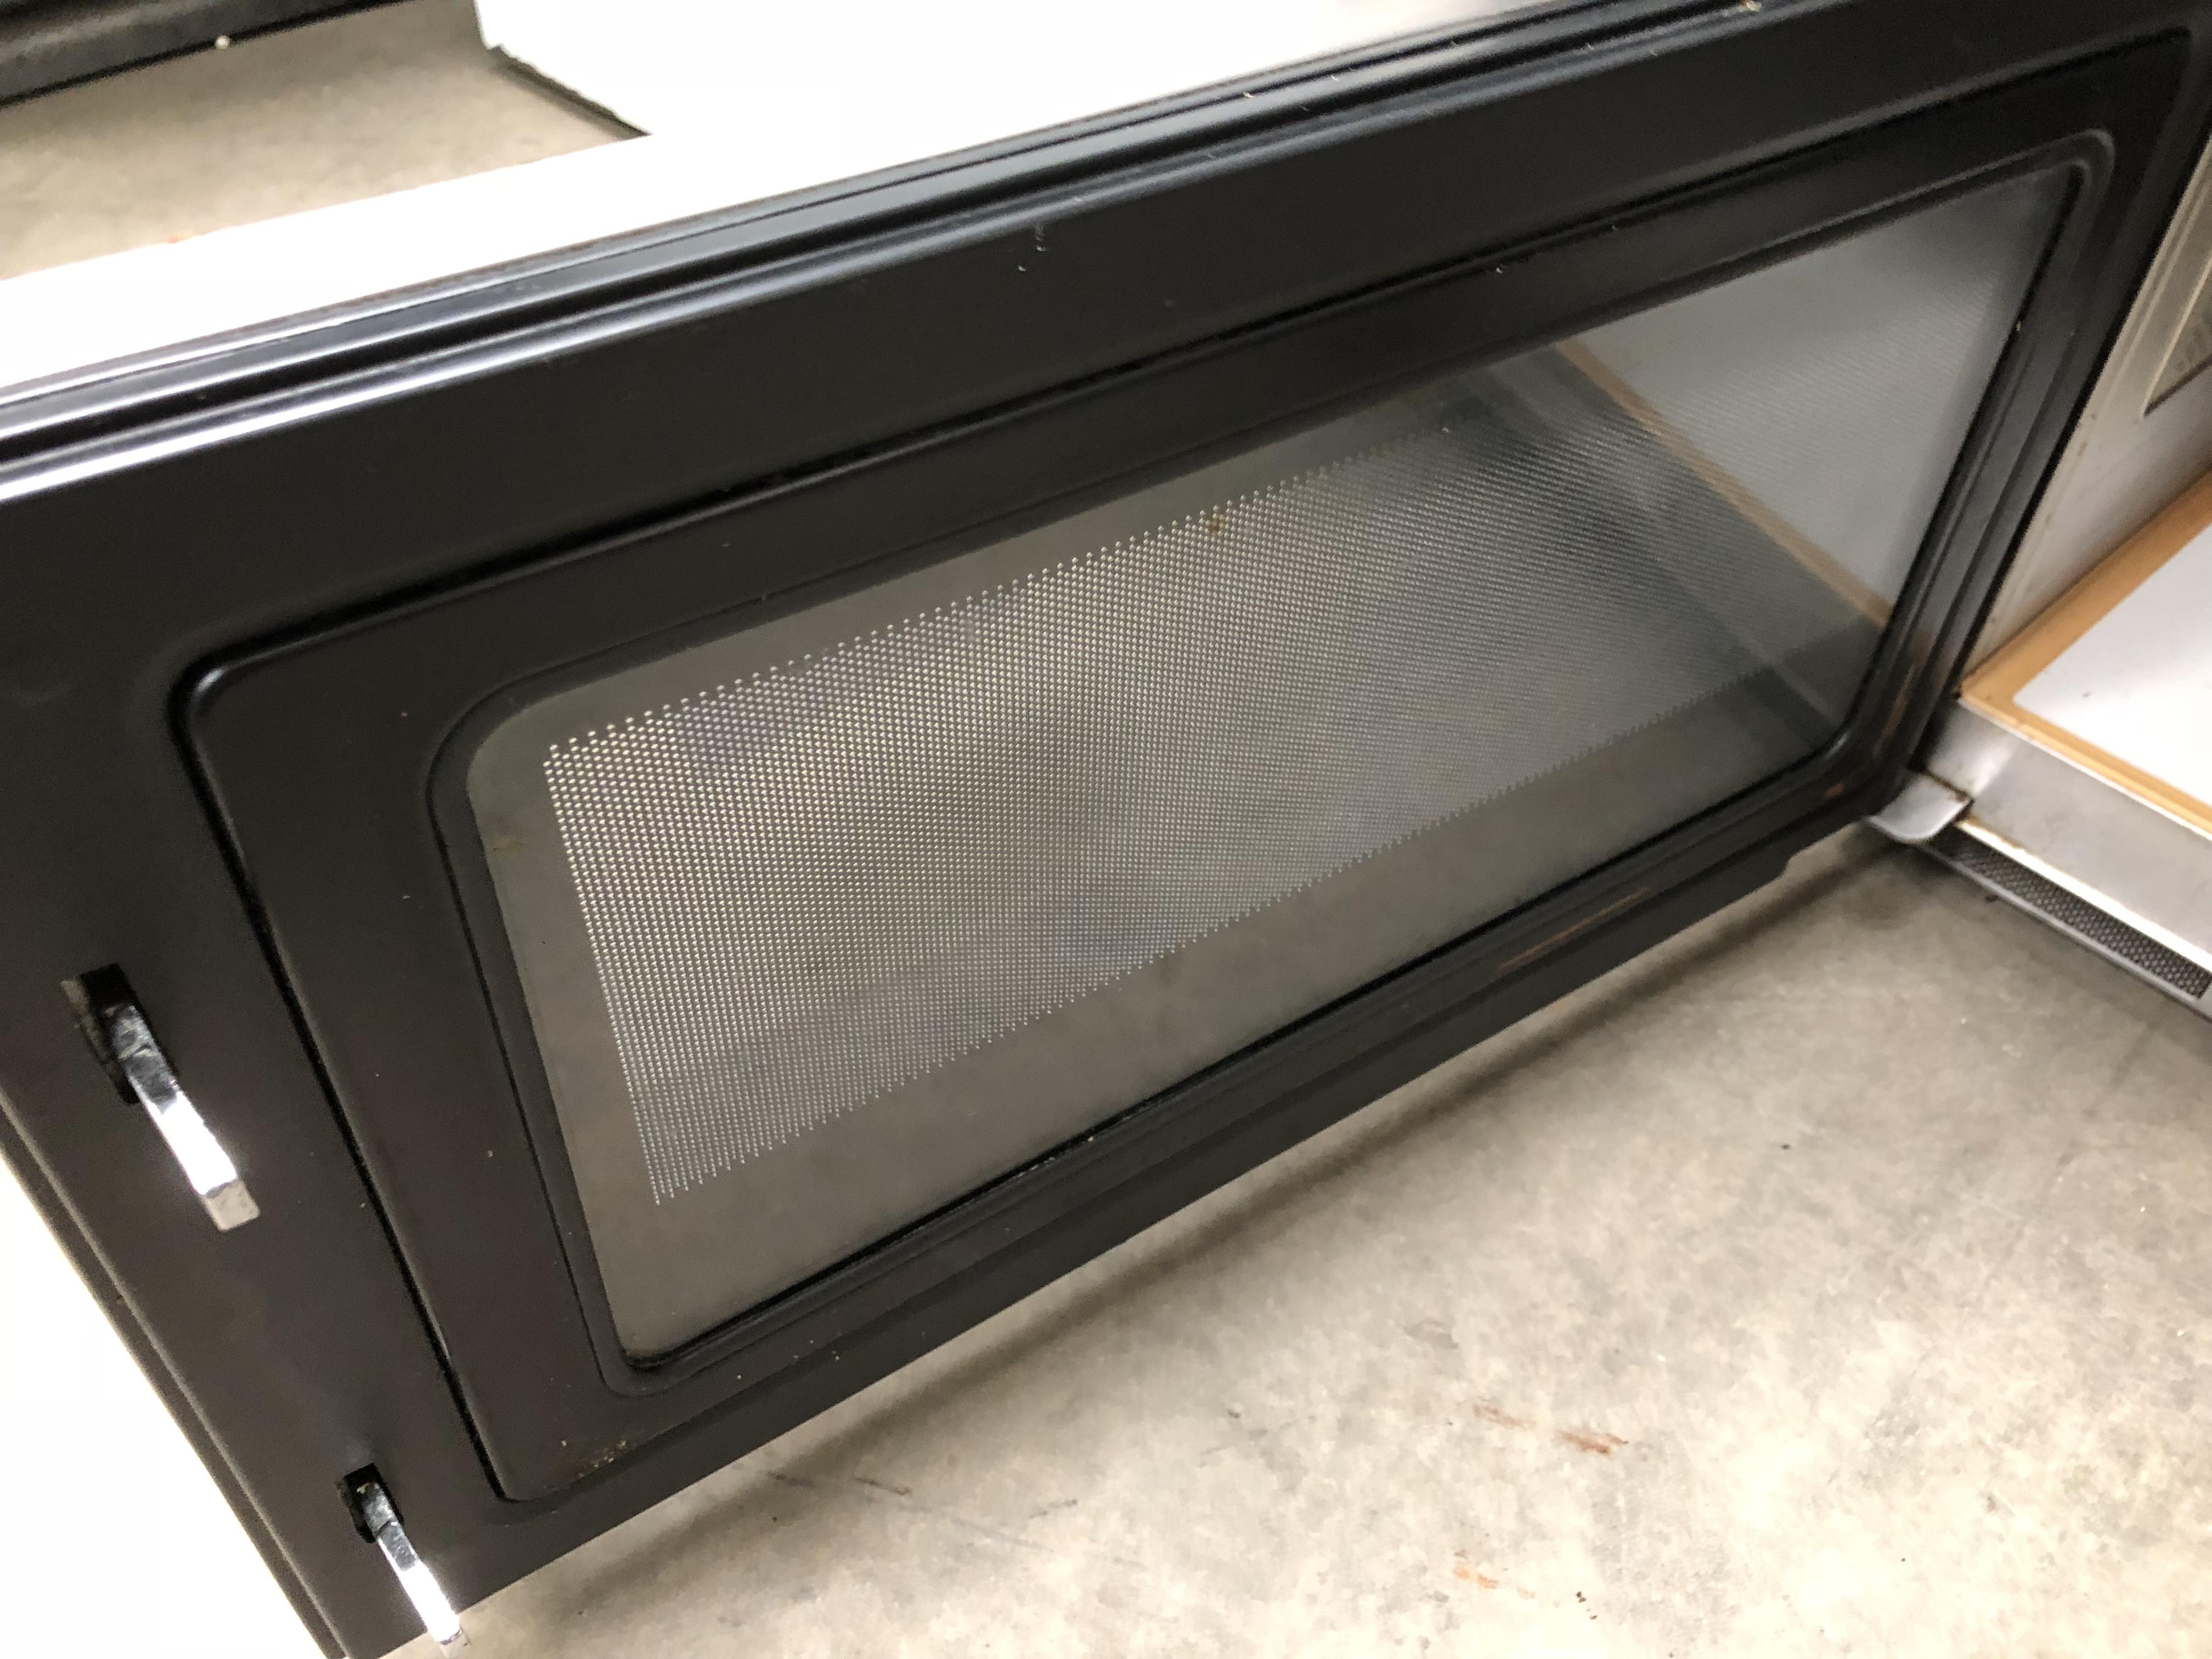 Lot 216 - Sharp 1900 watt Microwave